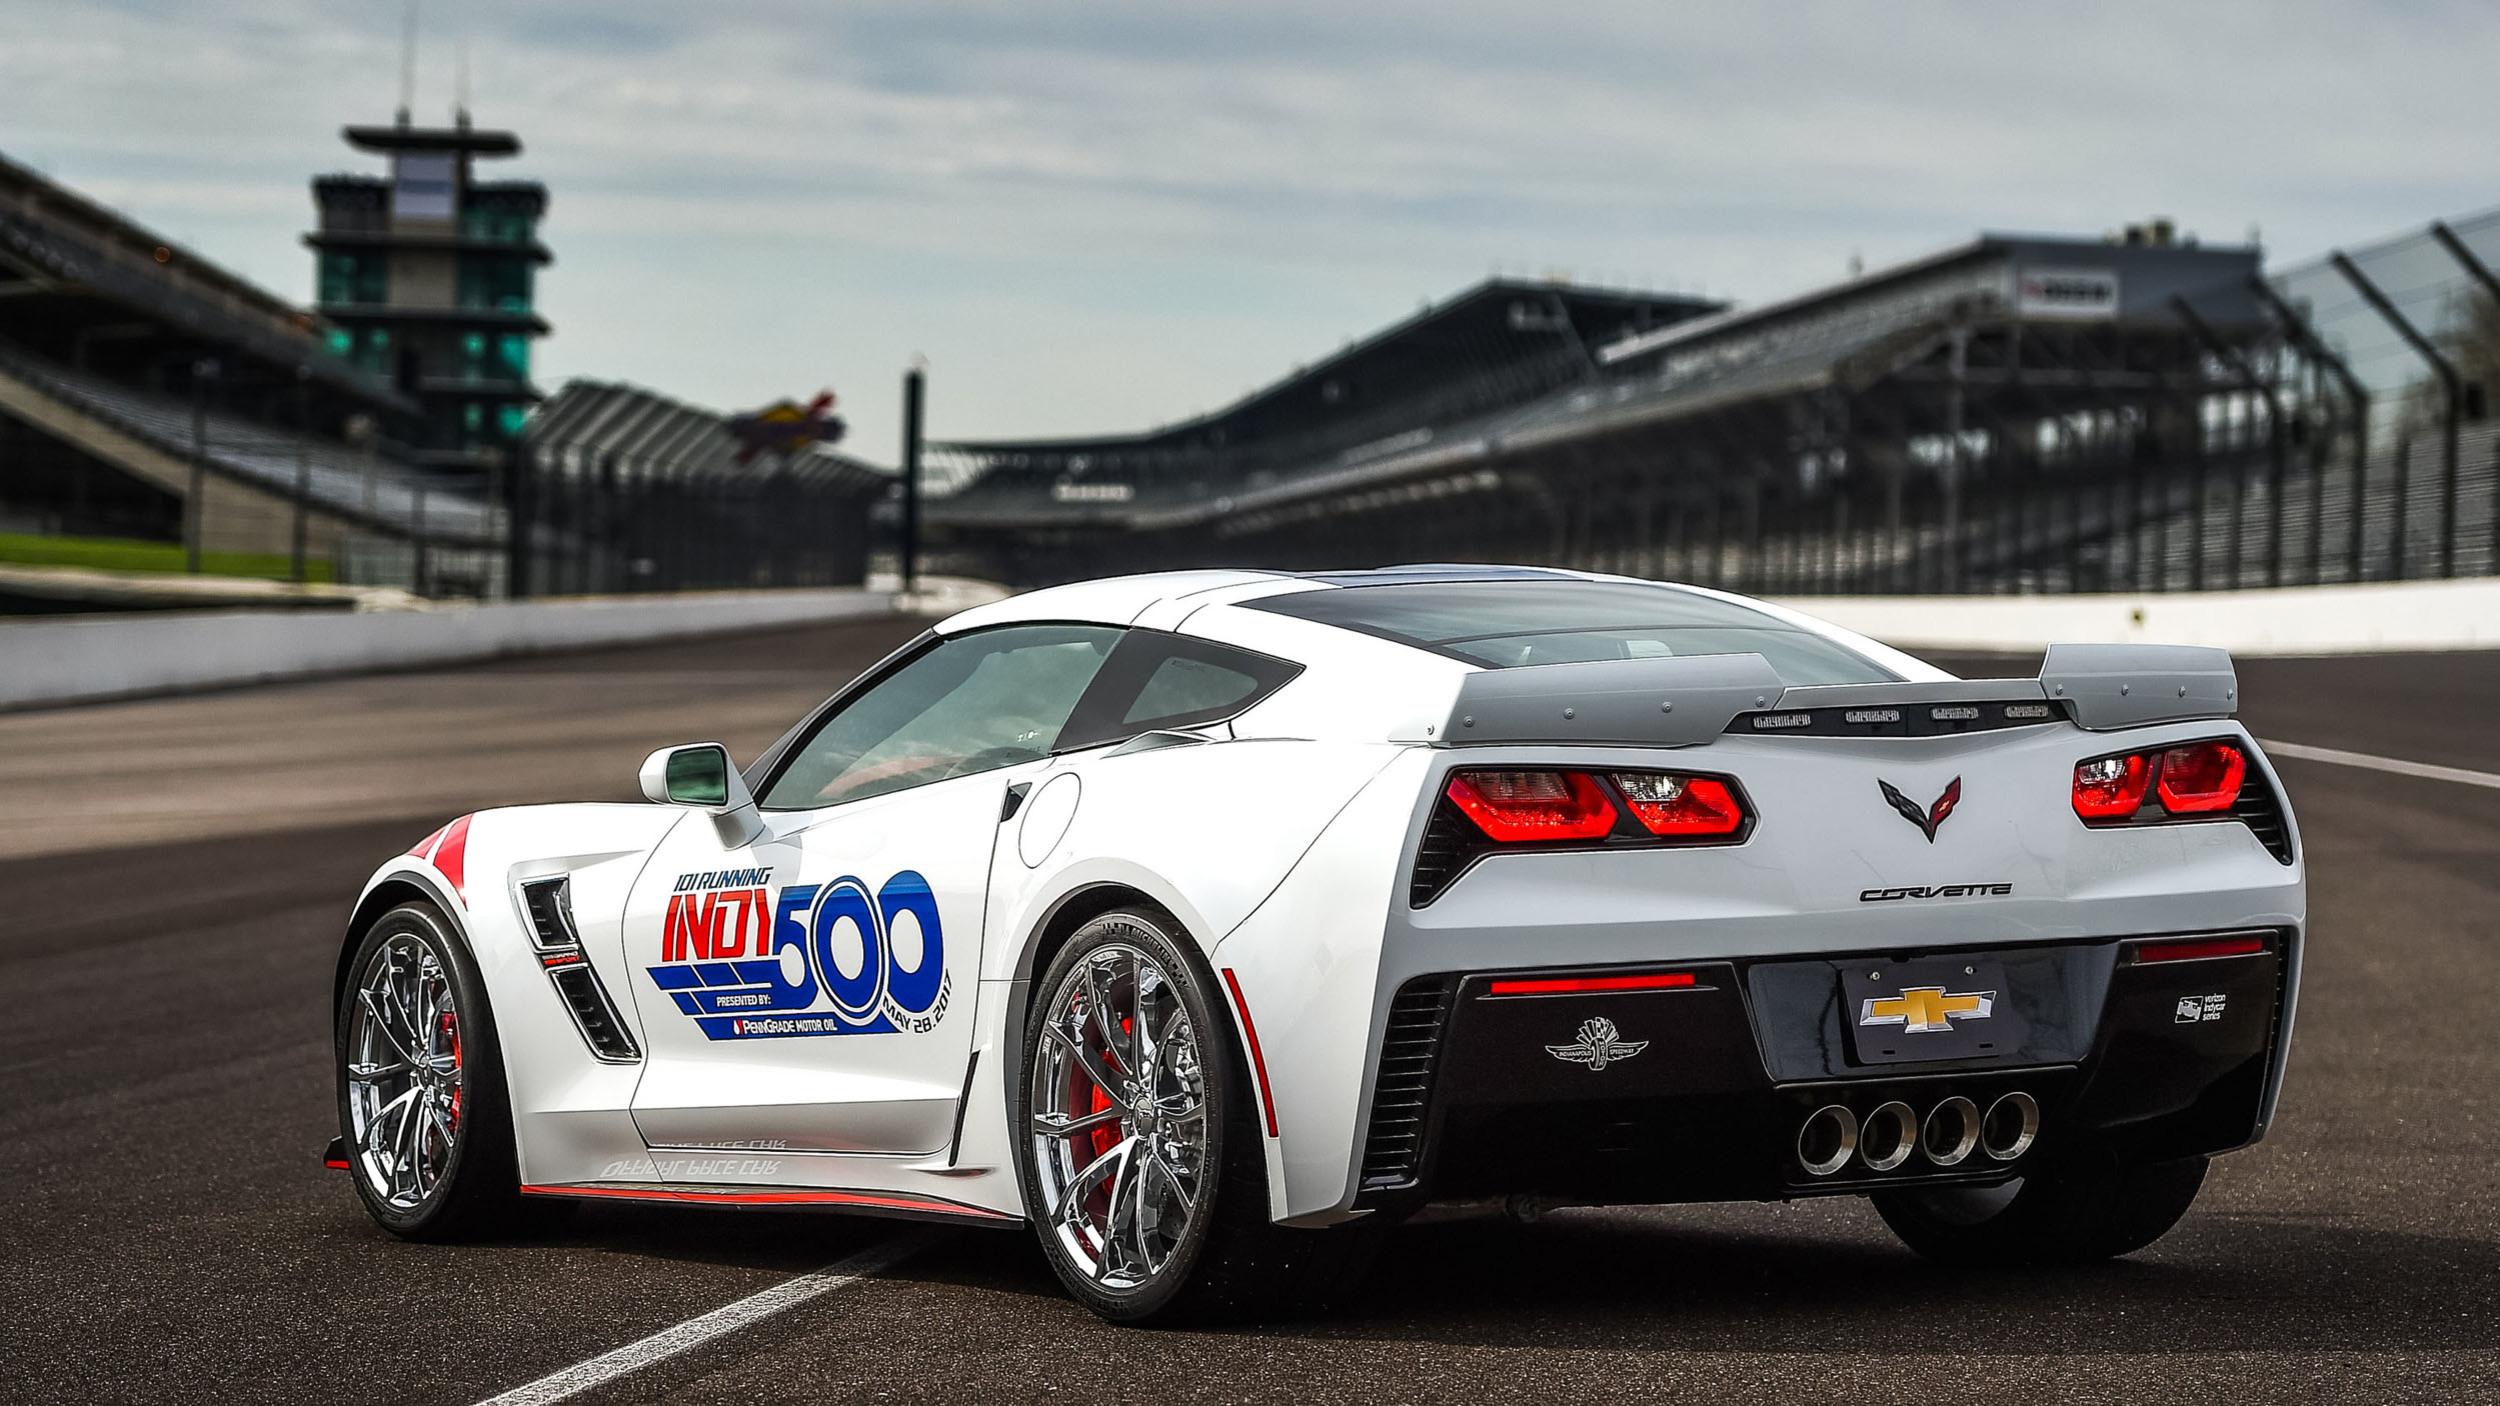 Chevrolet Corvette Grand Sport pace car Indy 500 (2)